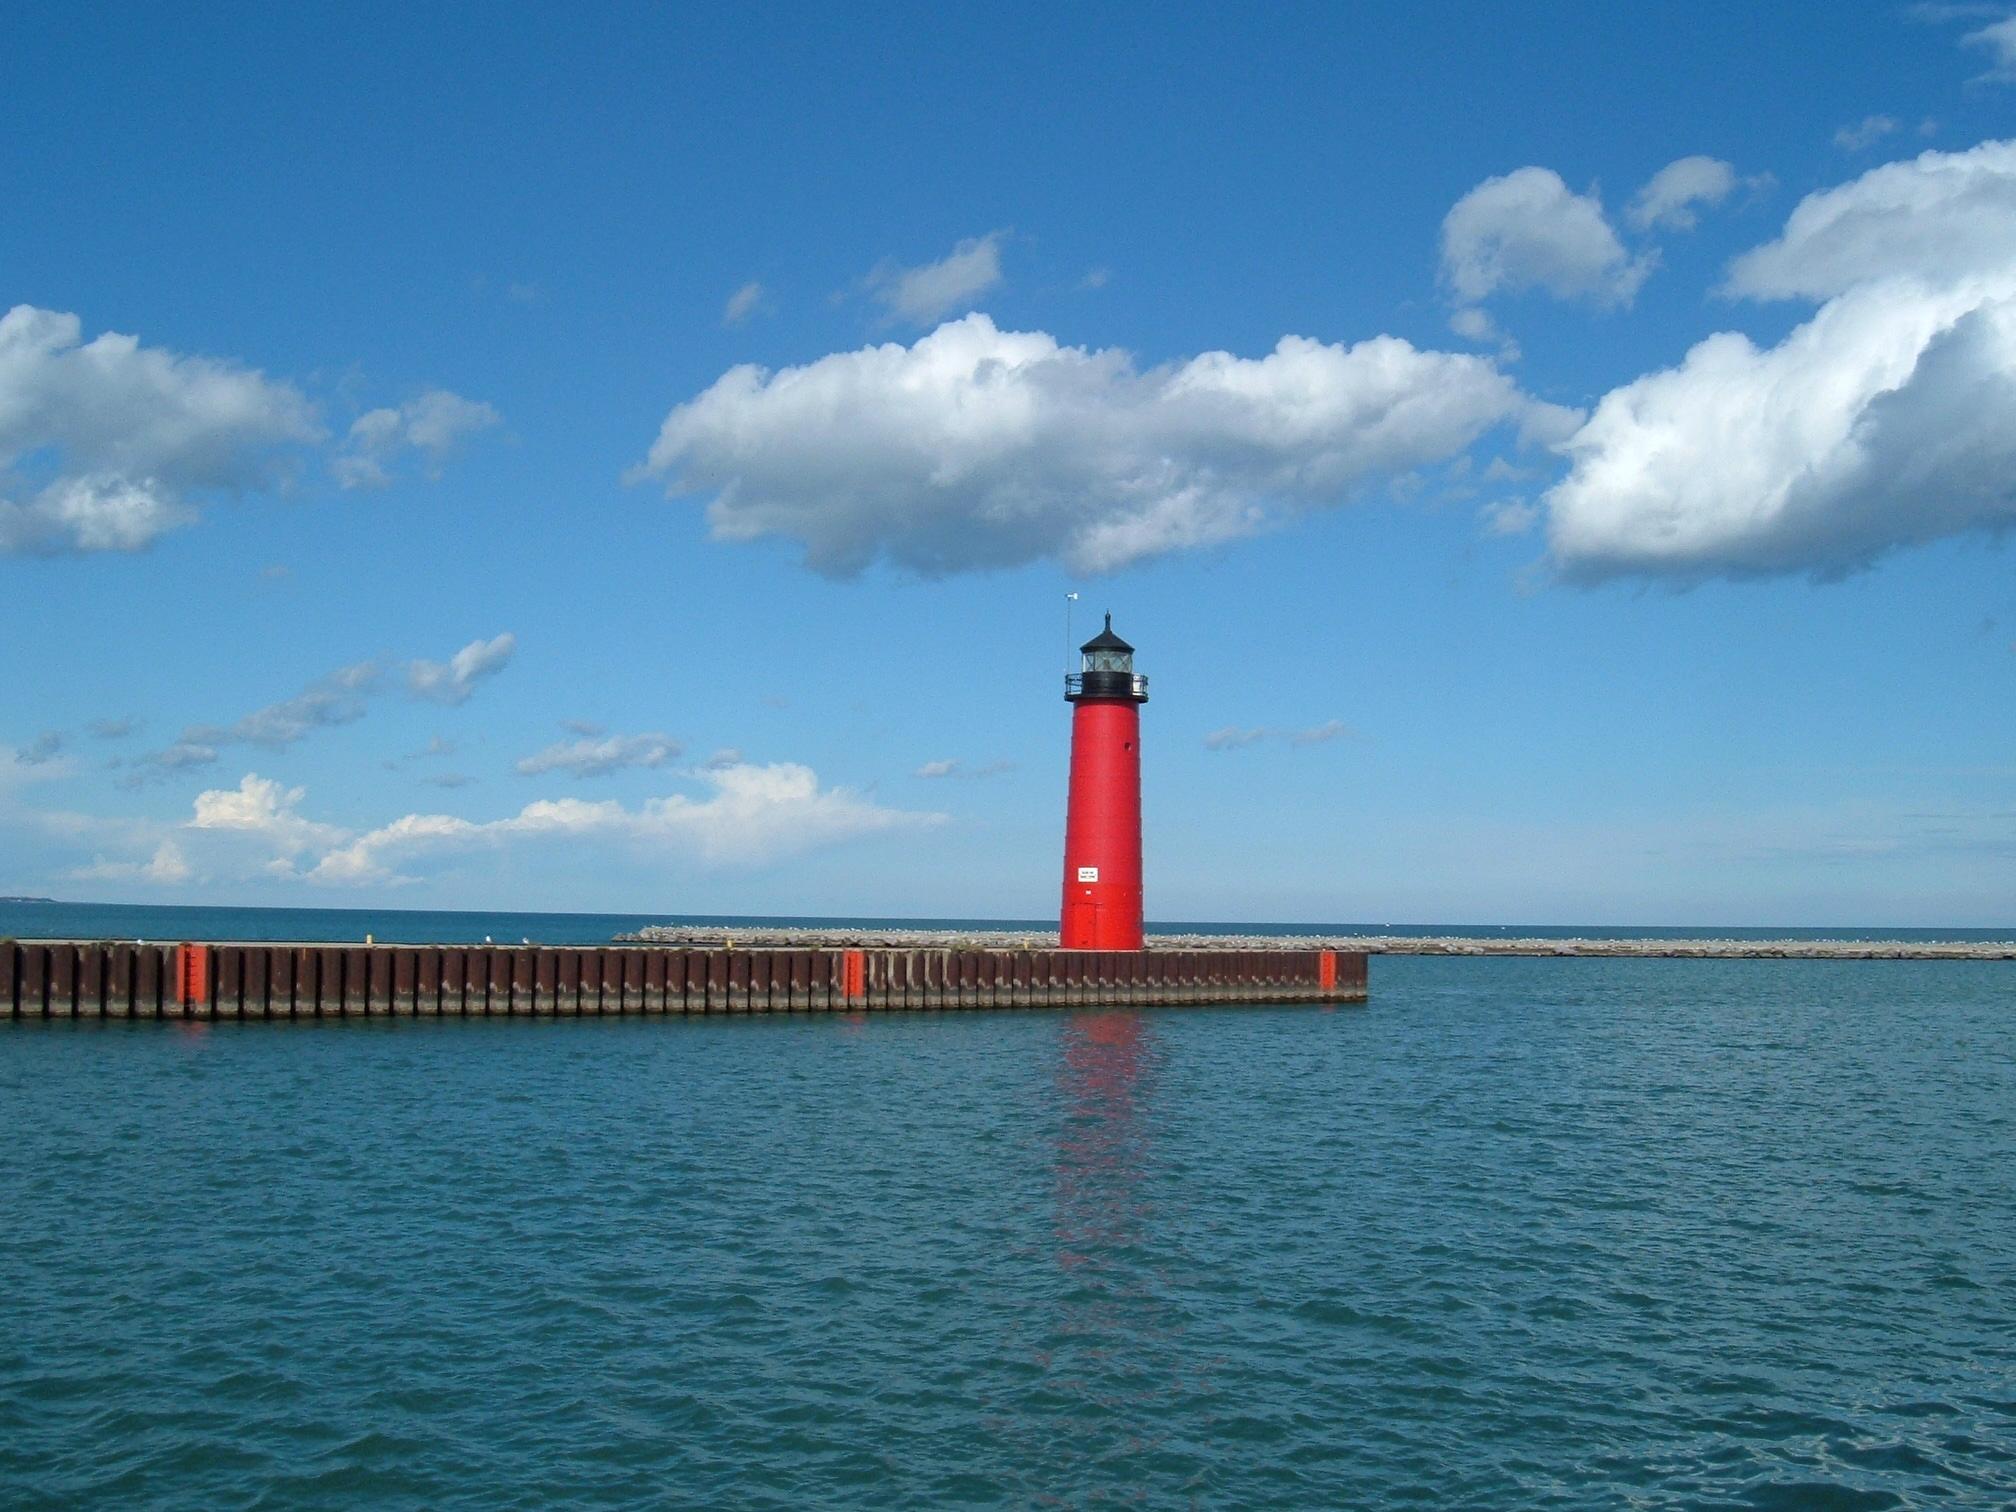 File:Kenosha North Pier Lighthouse.jpg - Wikimedia Commons